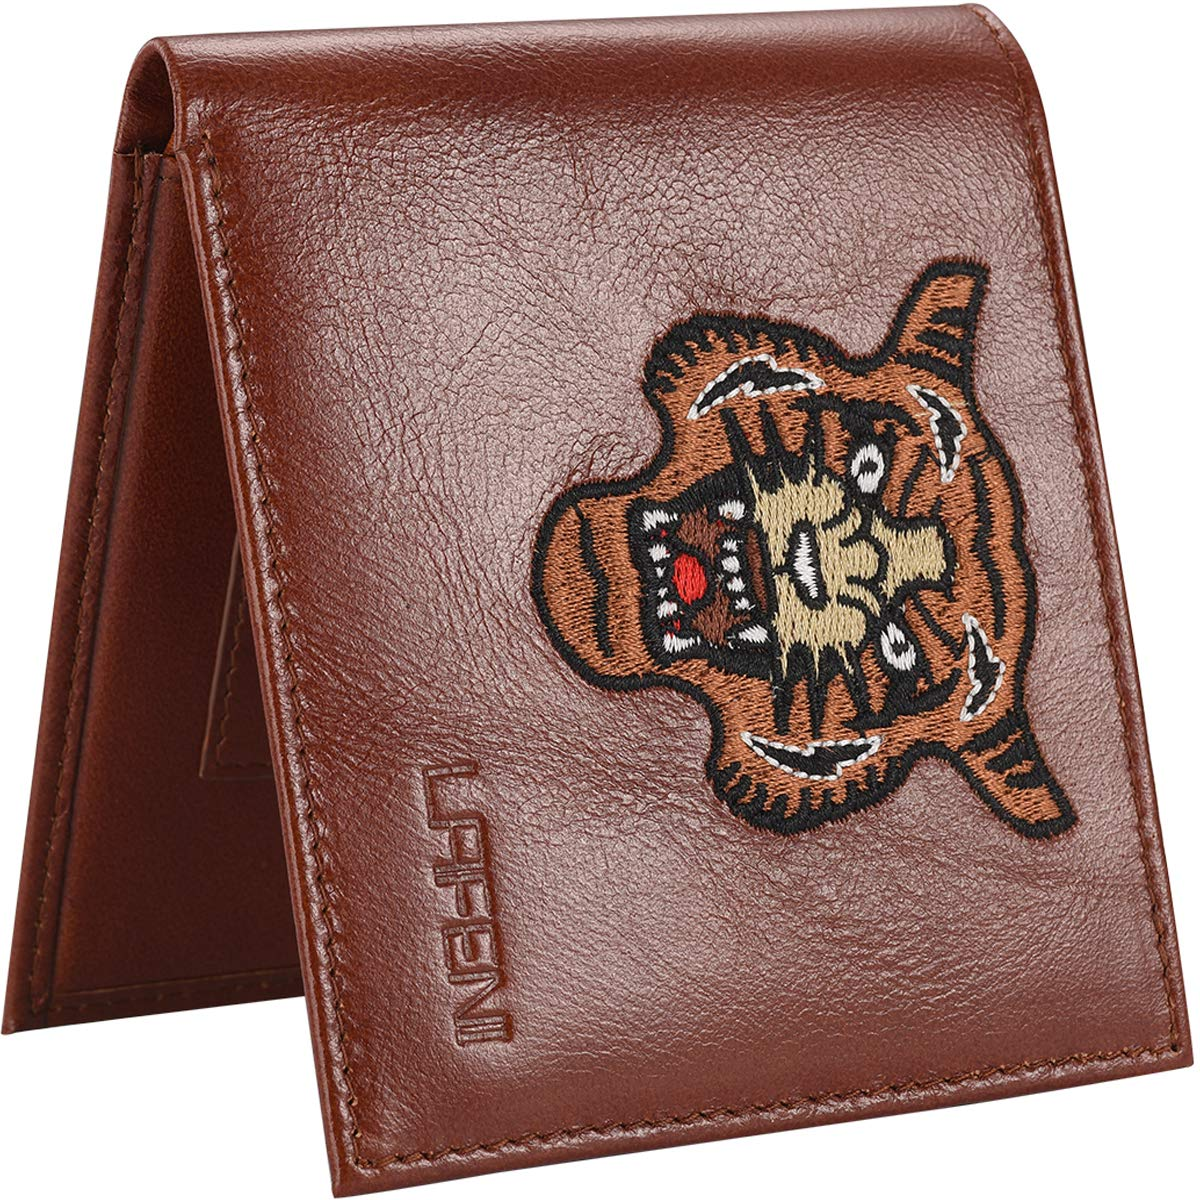 LAFENI Bifold Wallet, Mens Genuine Leather RFID Blocking Wallet with ID Window BifoldWallet-Black-FBA